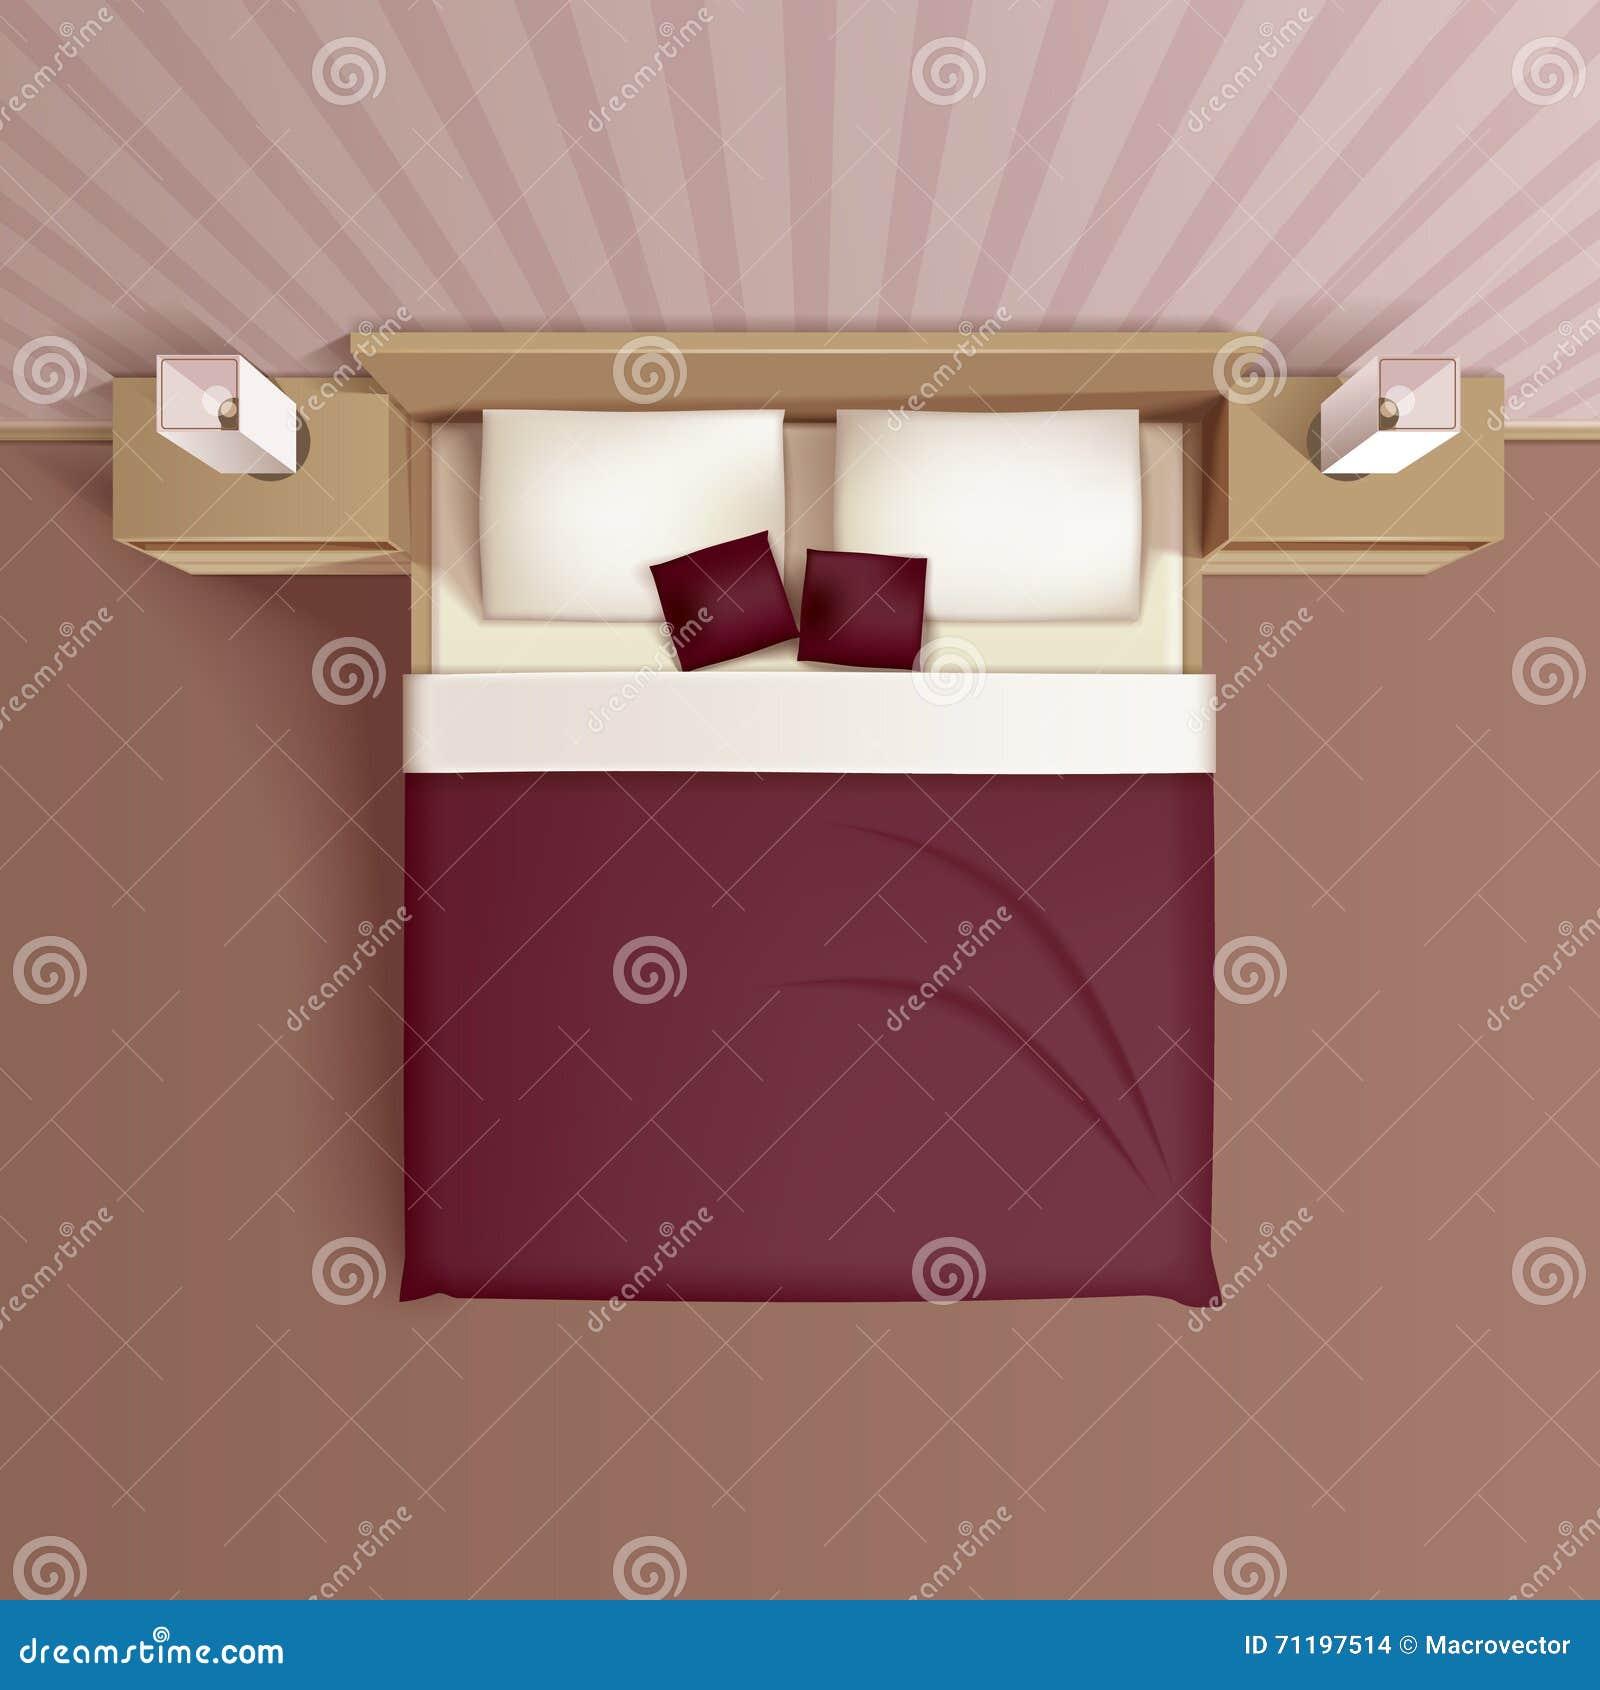 Bedroom Interior Top View Realistic Image Stock Vector